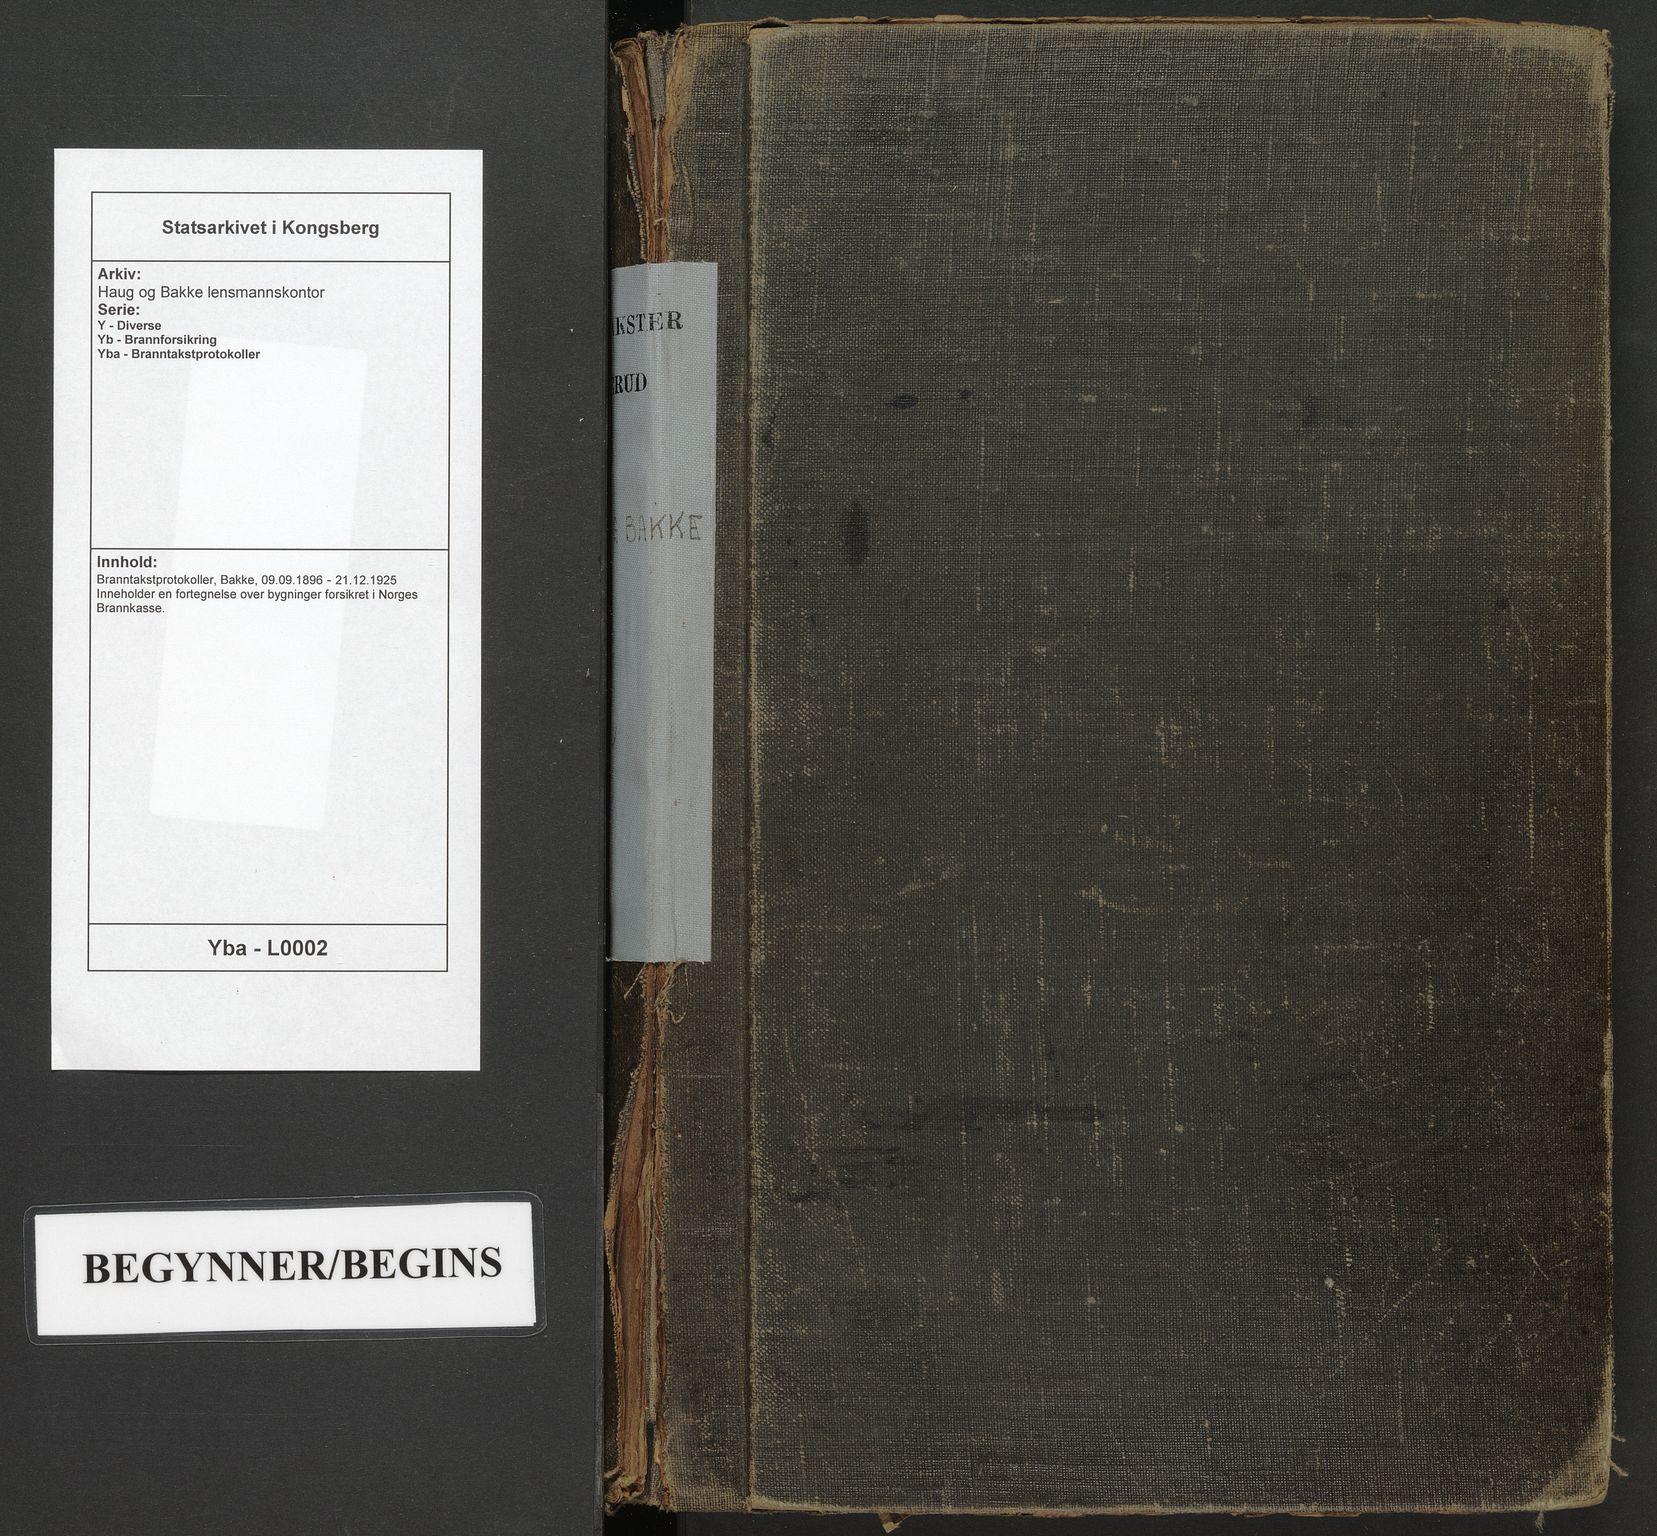 SAKO, Haug og Bakke lensmannskontor, Y/Yb/Yba/L0002: Branntakstprotokoller, Bakke, 1896-1925